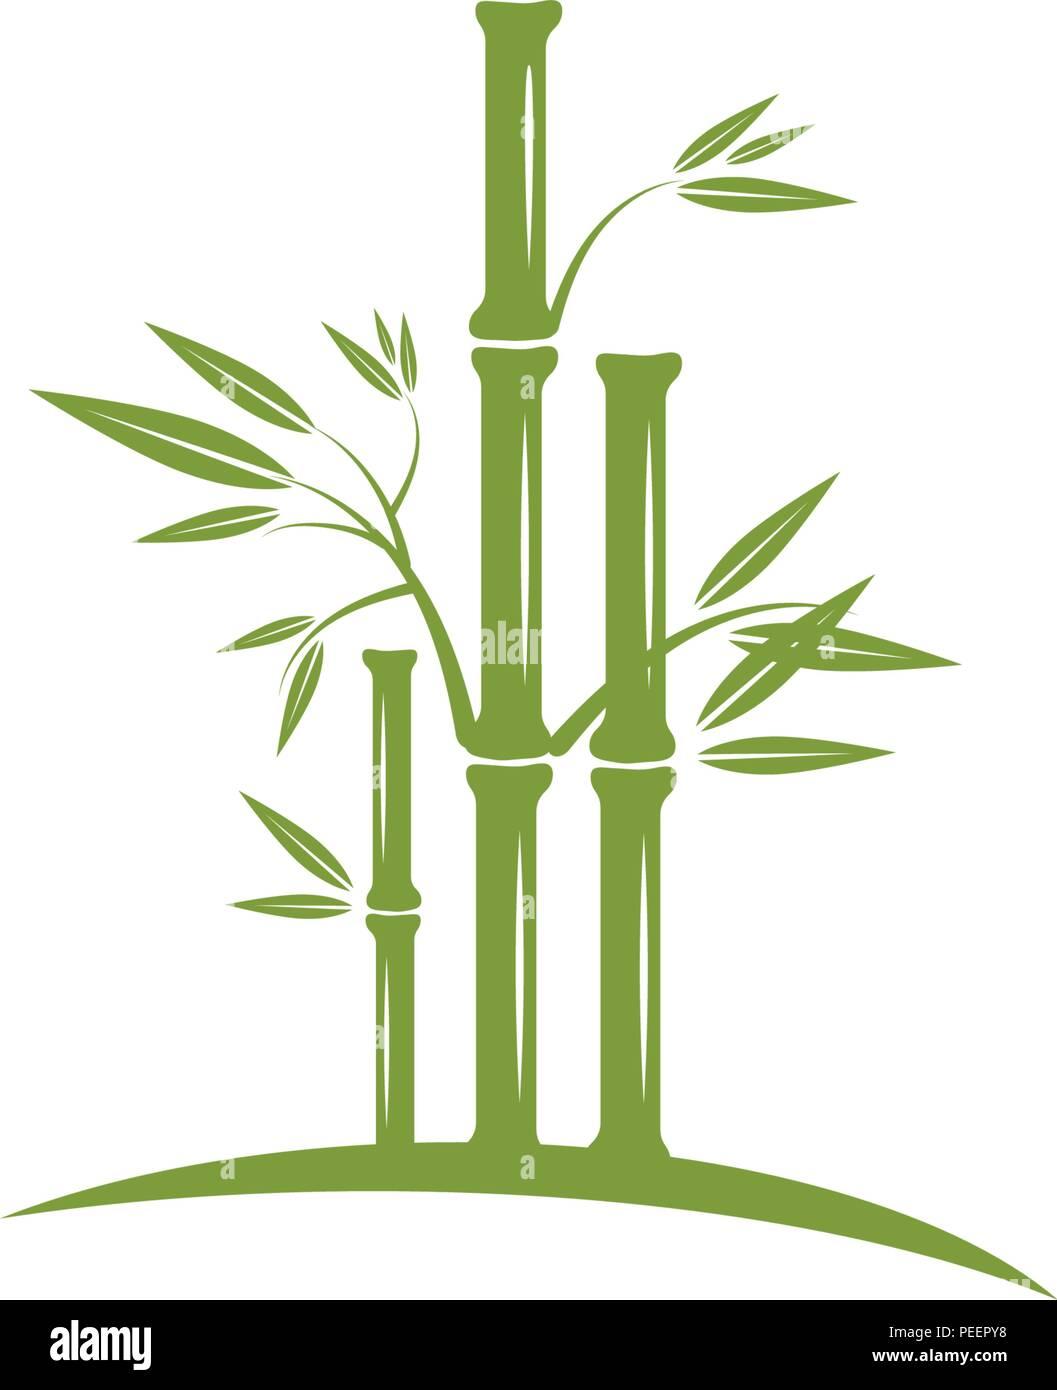 Bambus Logo Vorlage Vektor Icon Abbildung Design Vektor Abbildung